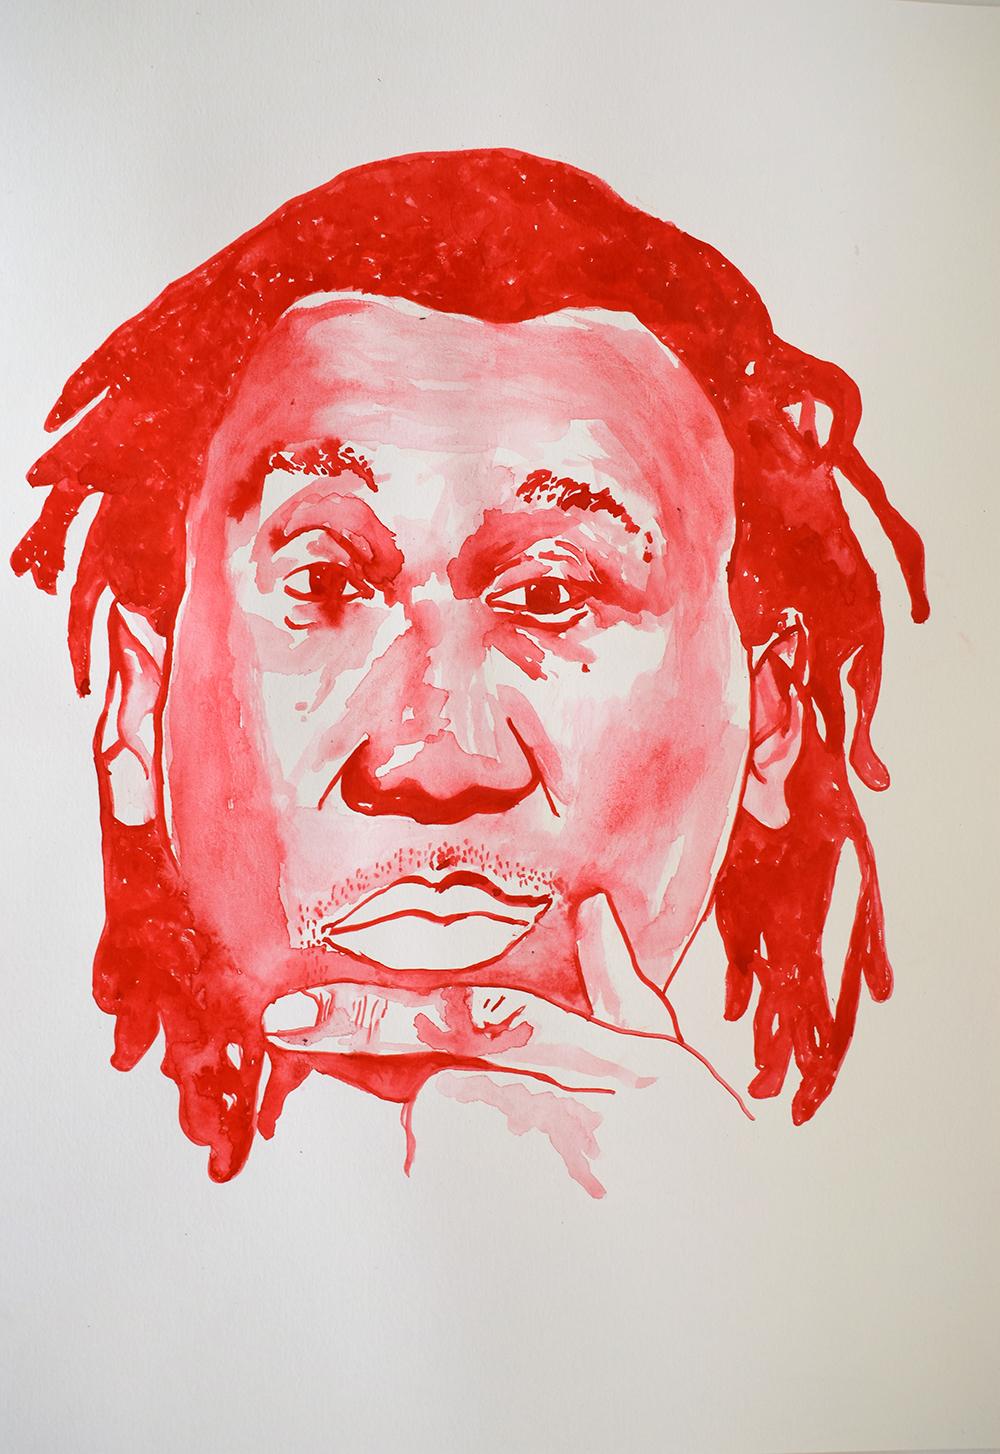 `Krs One', 29.7 x 42.0cm, watercolour on 230g akvarel paper, 2017